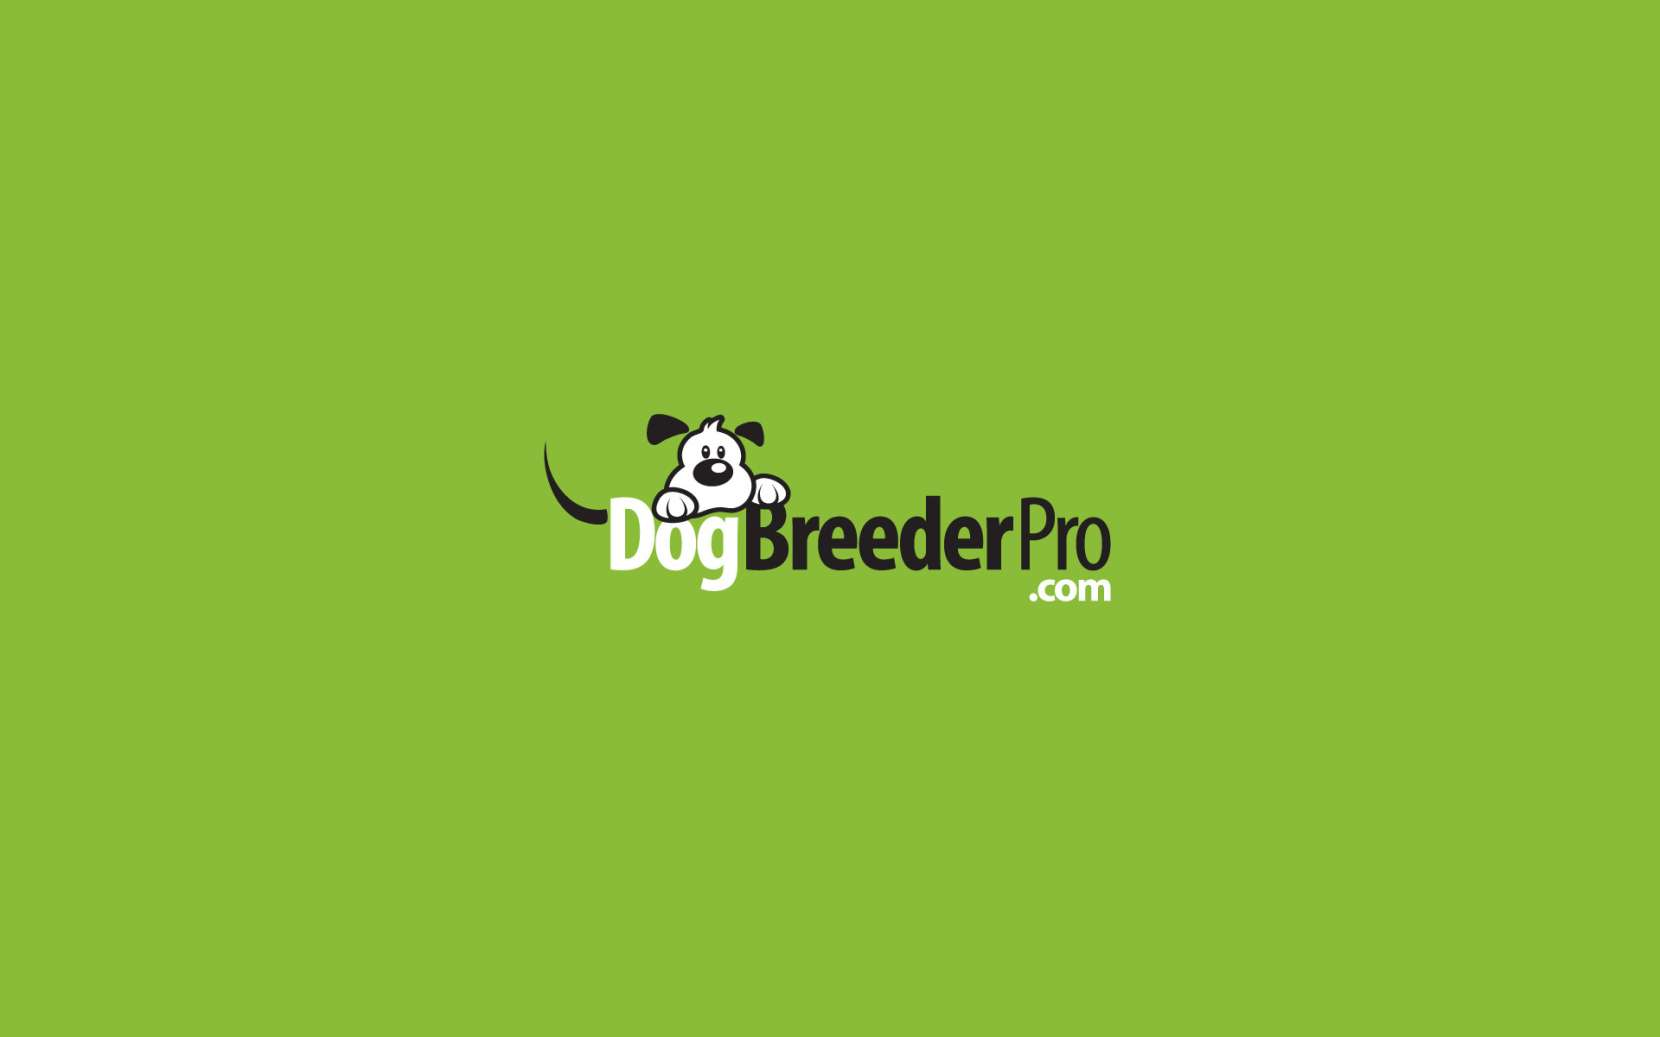 Dog-Breeder-Pro.jpg